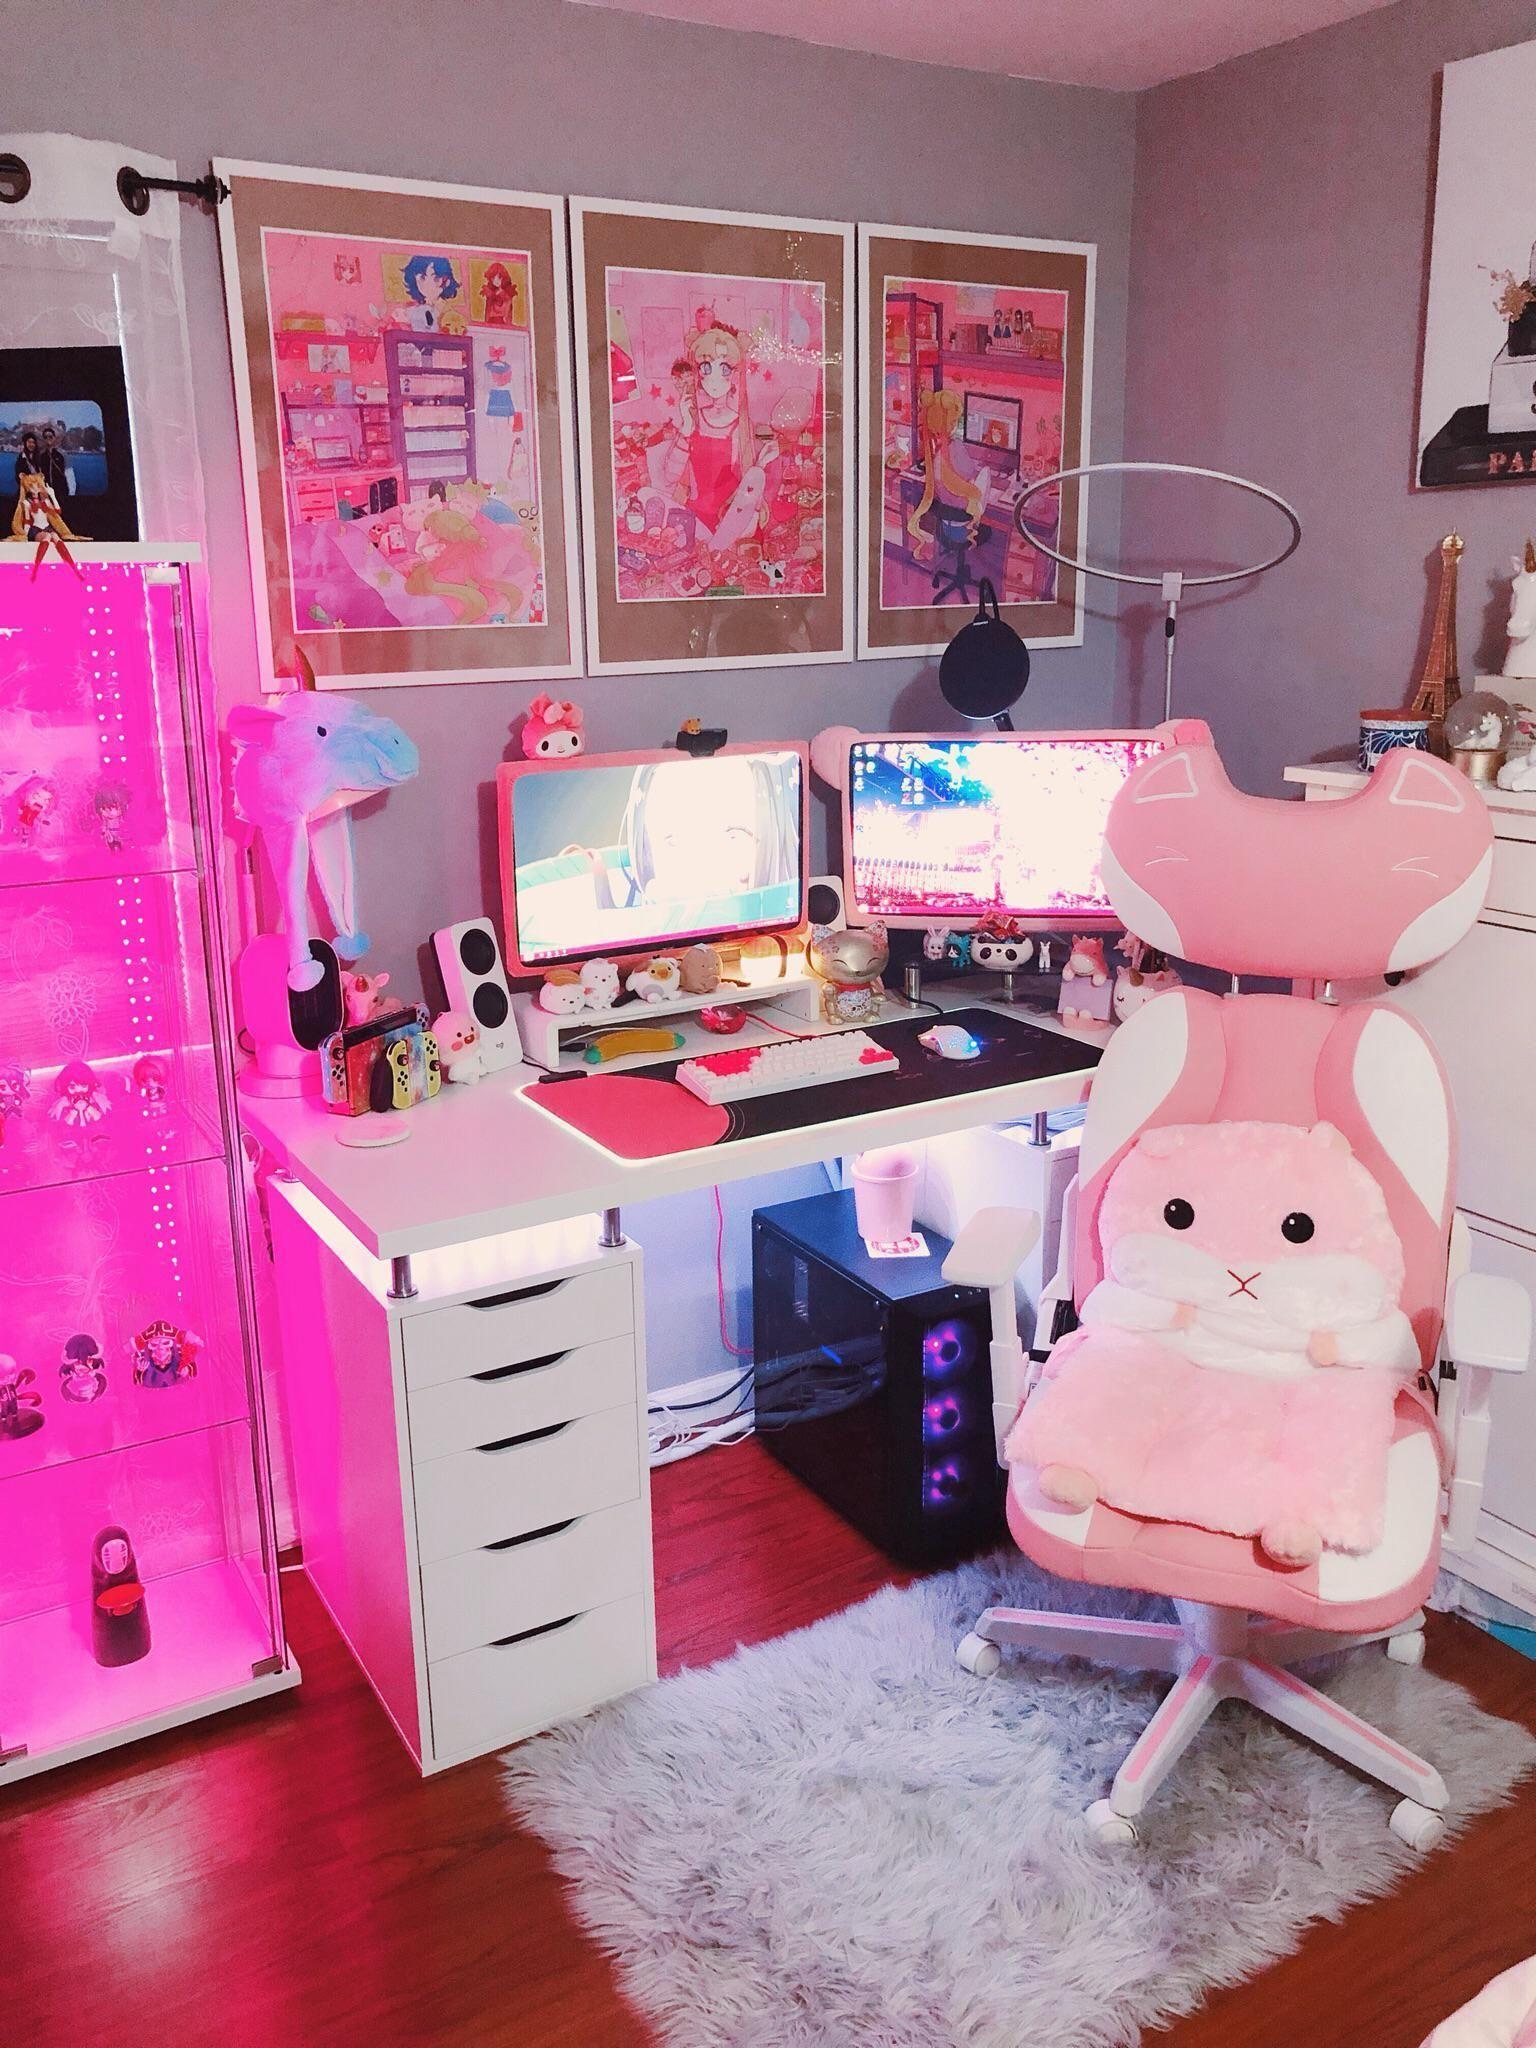 Anime bedroom ideas in 2020 20 suprisingly ideas